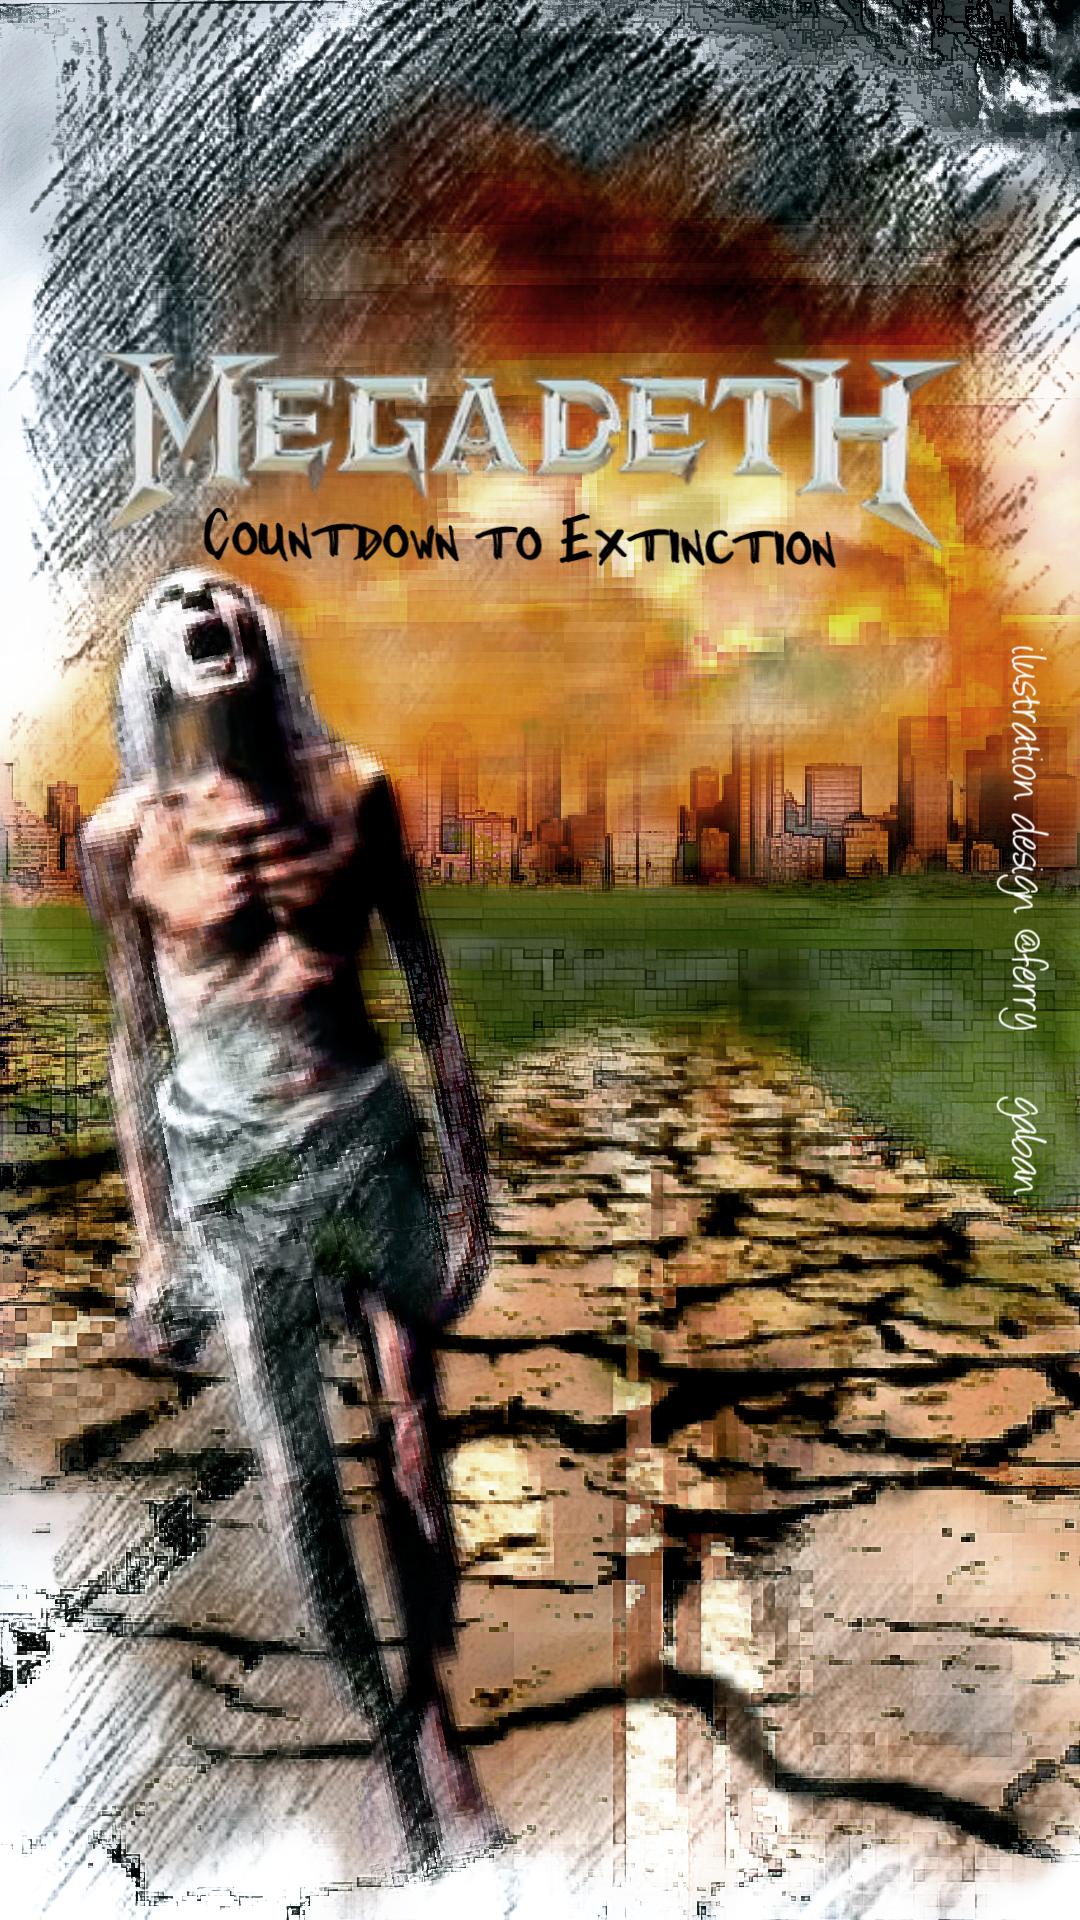 Greenlinedesign Countdown To Extinction Album 1992megadethmegadeth Vicrattlehead Rattlehead Countdowntoextinction